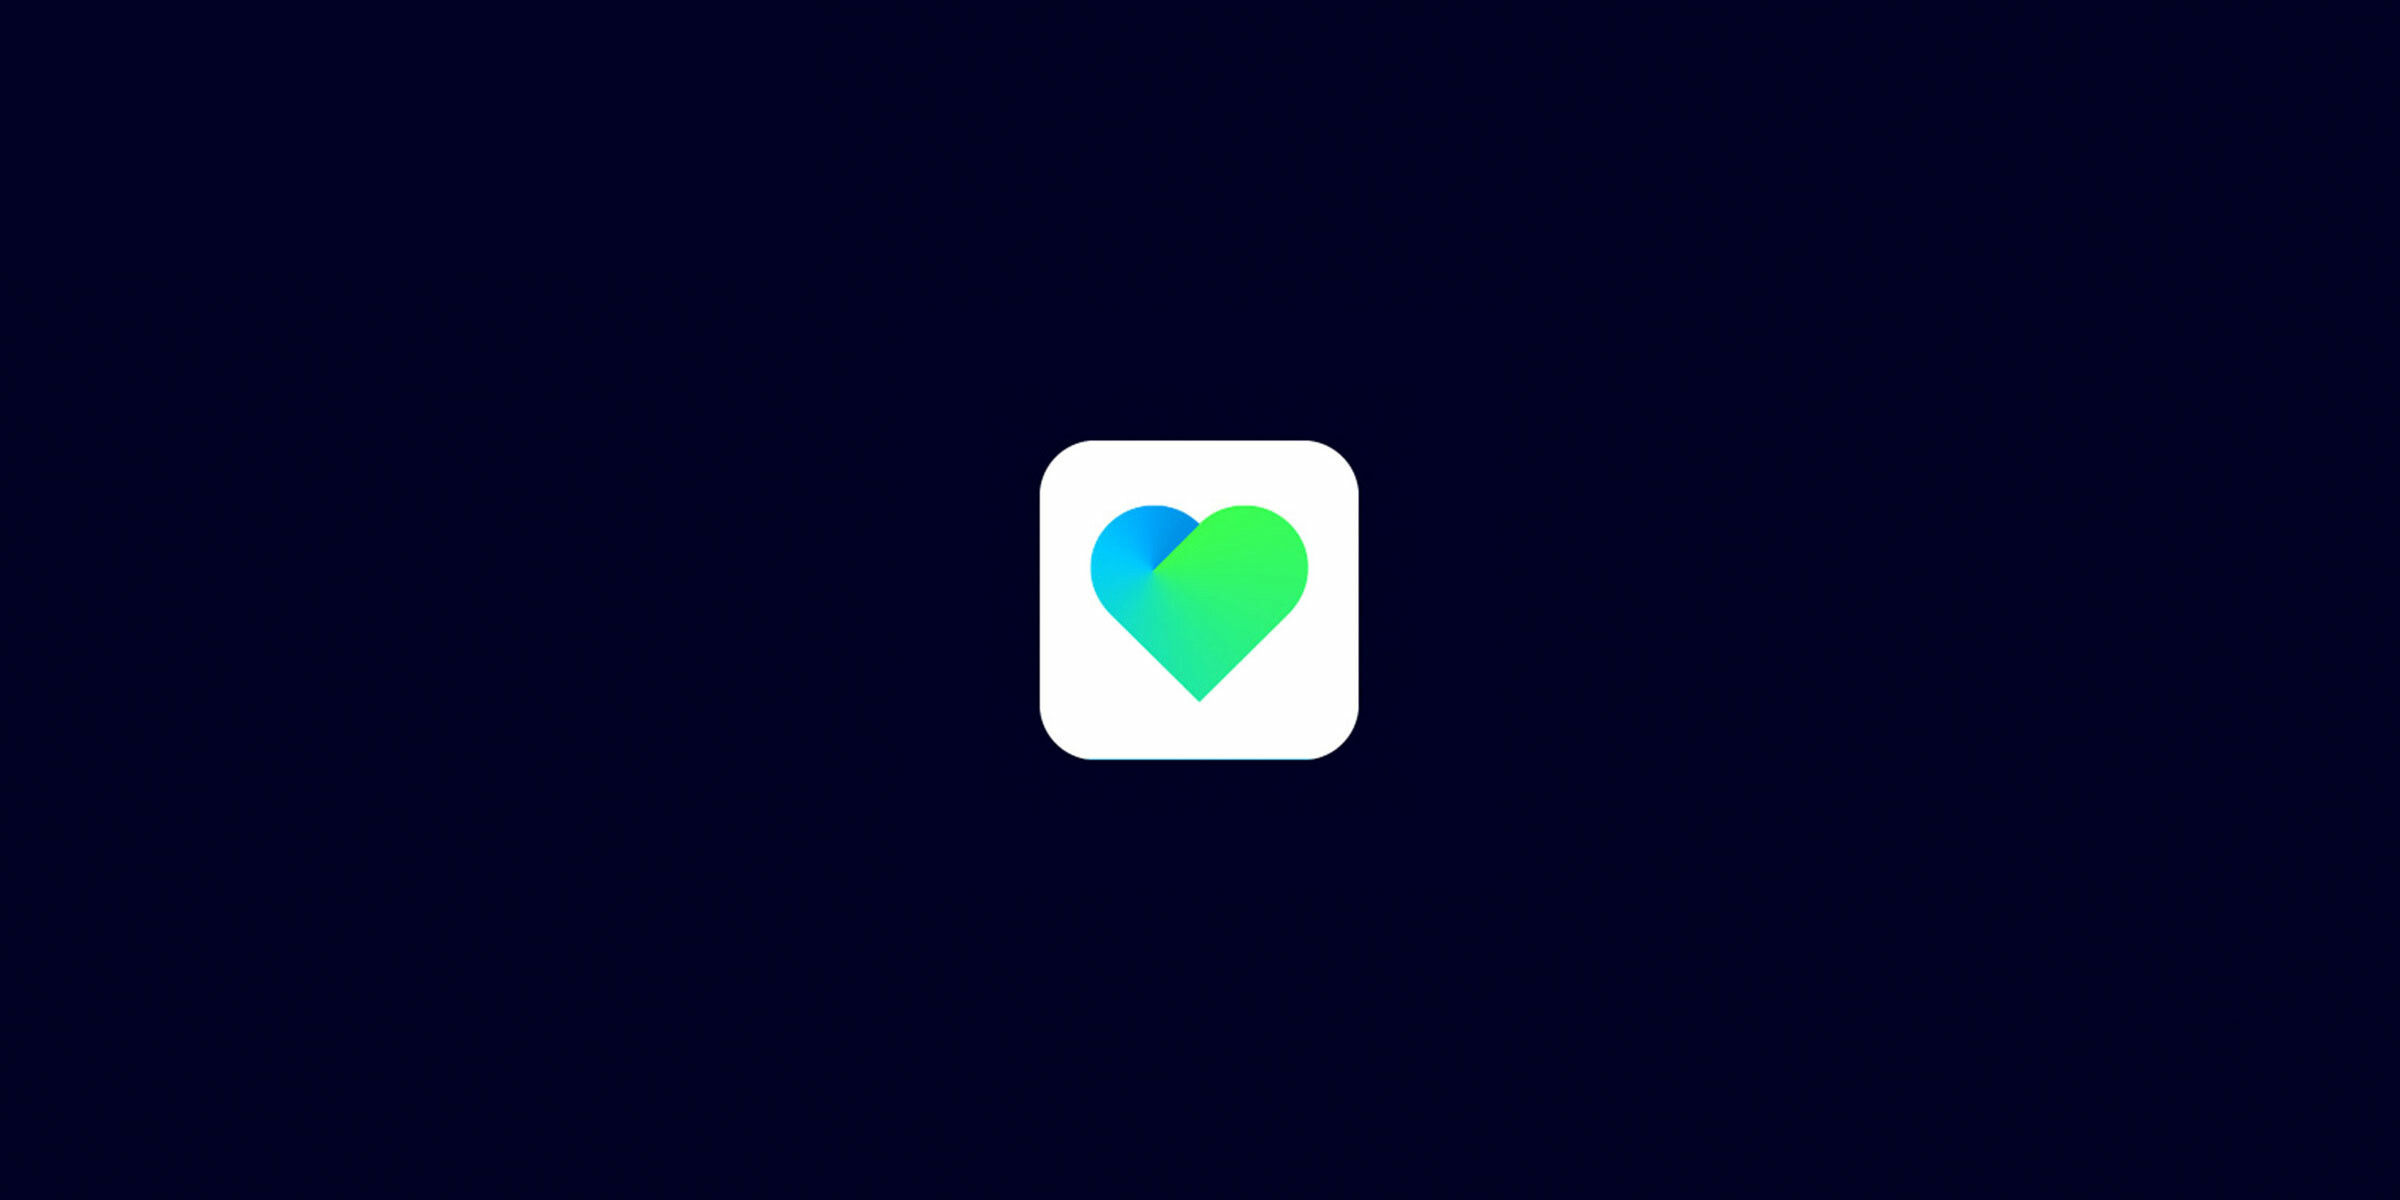 Find mate app